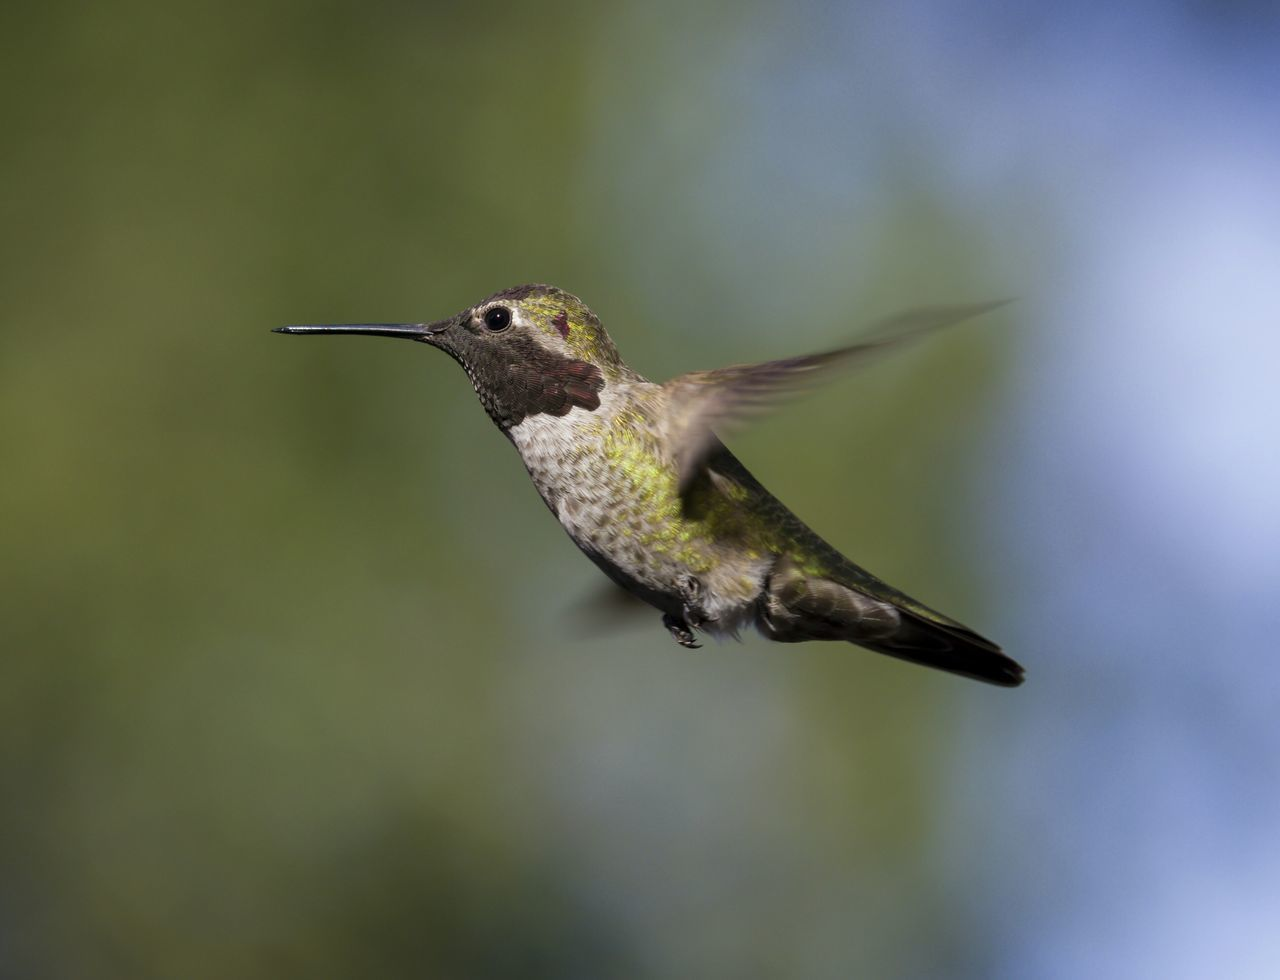 Beautiful stock photos of kolibri, Horizontal Image, Olive, animal themes, animals in the wild